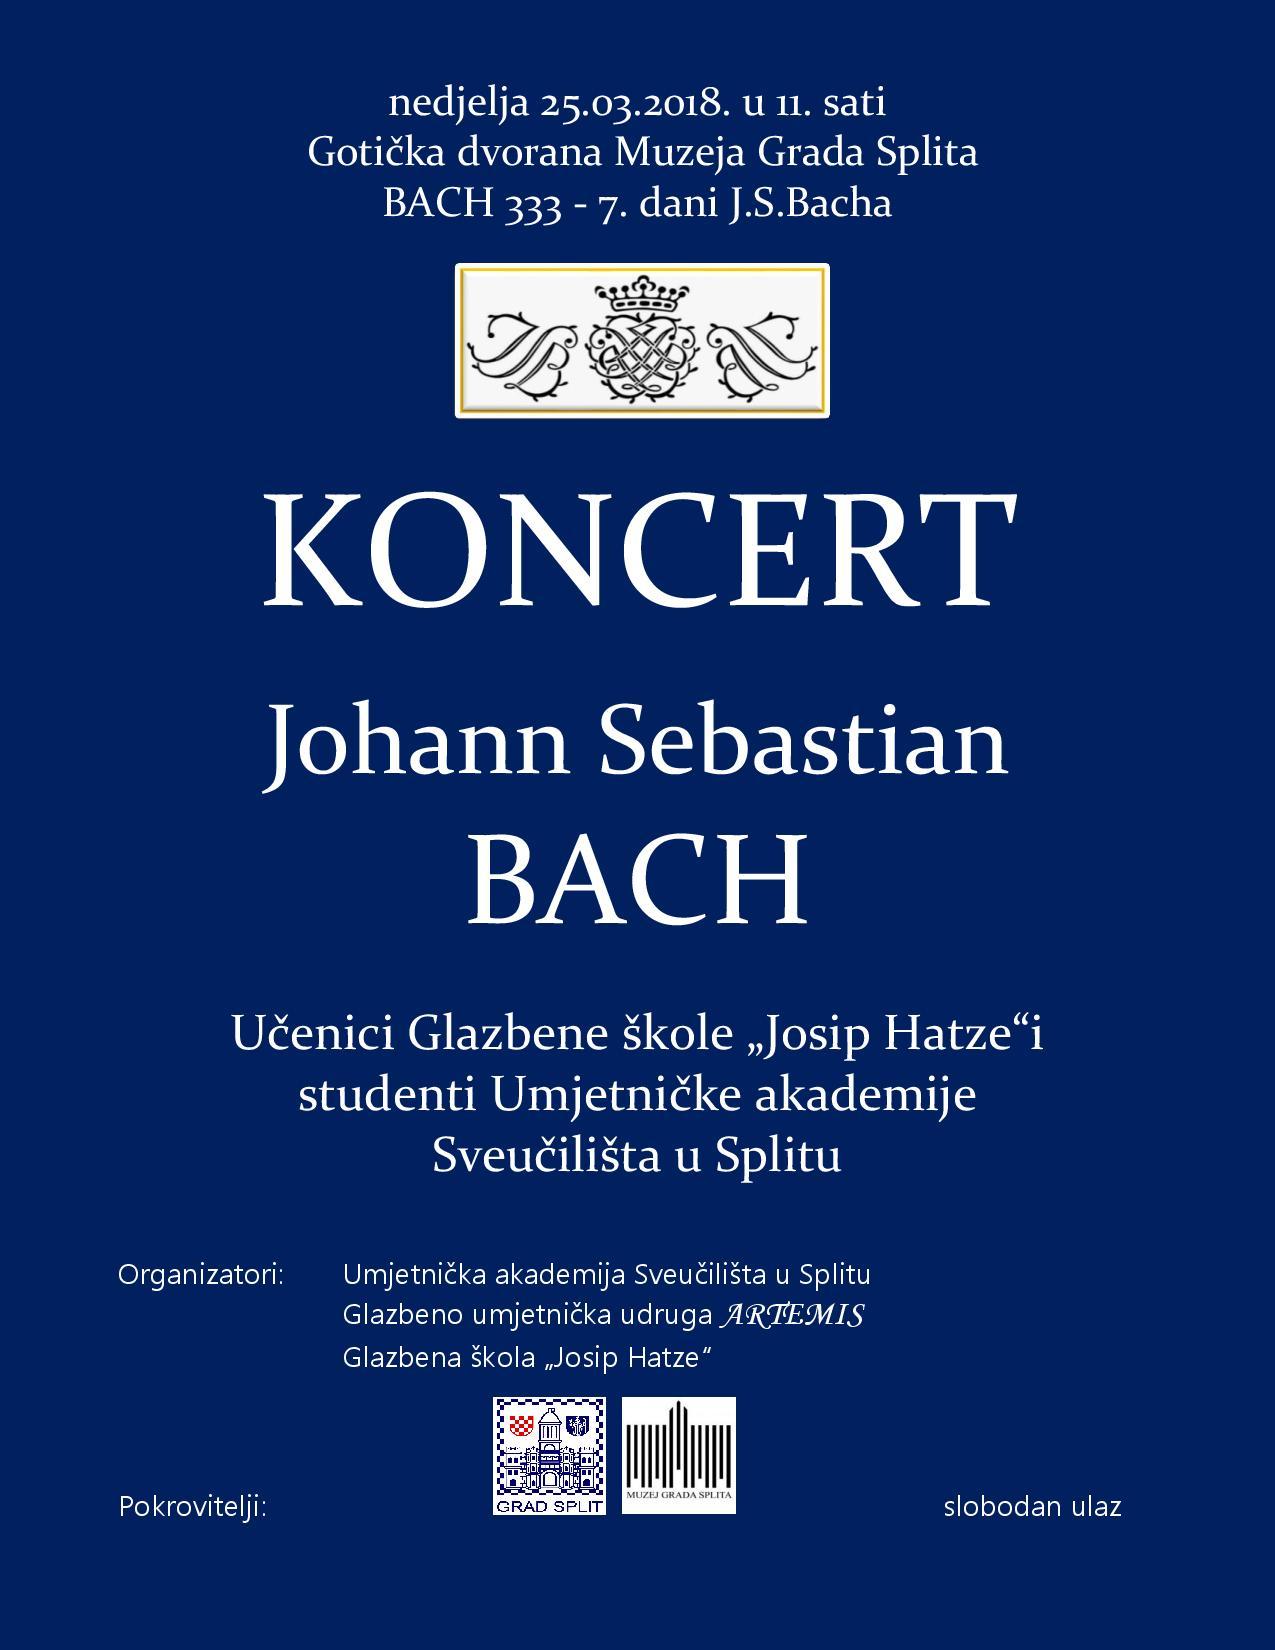 Plakat Muzej Bach 333 - 7 Dani Bacha